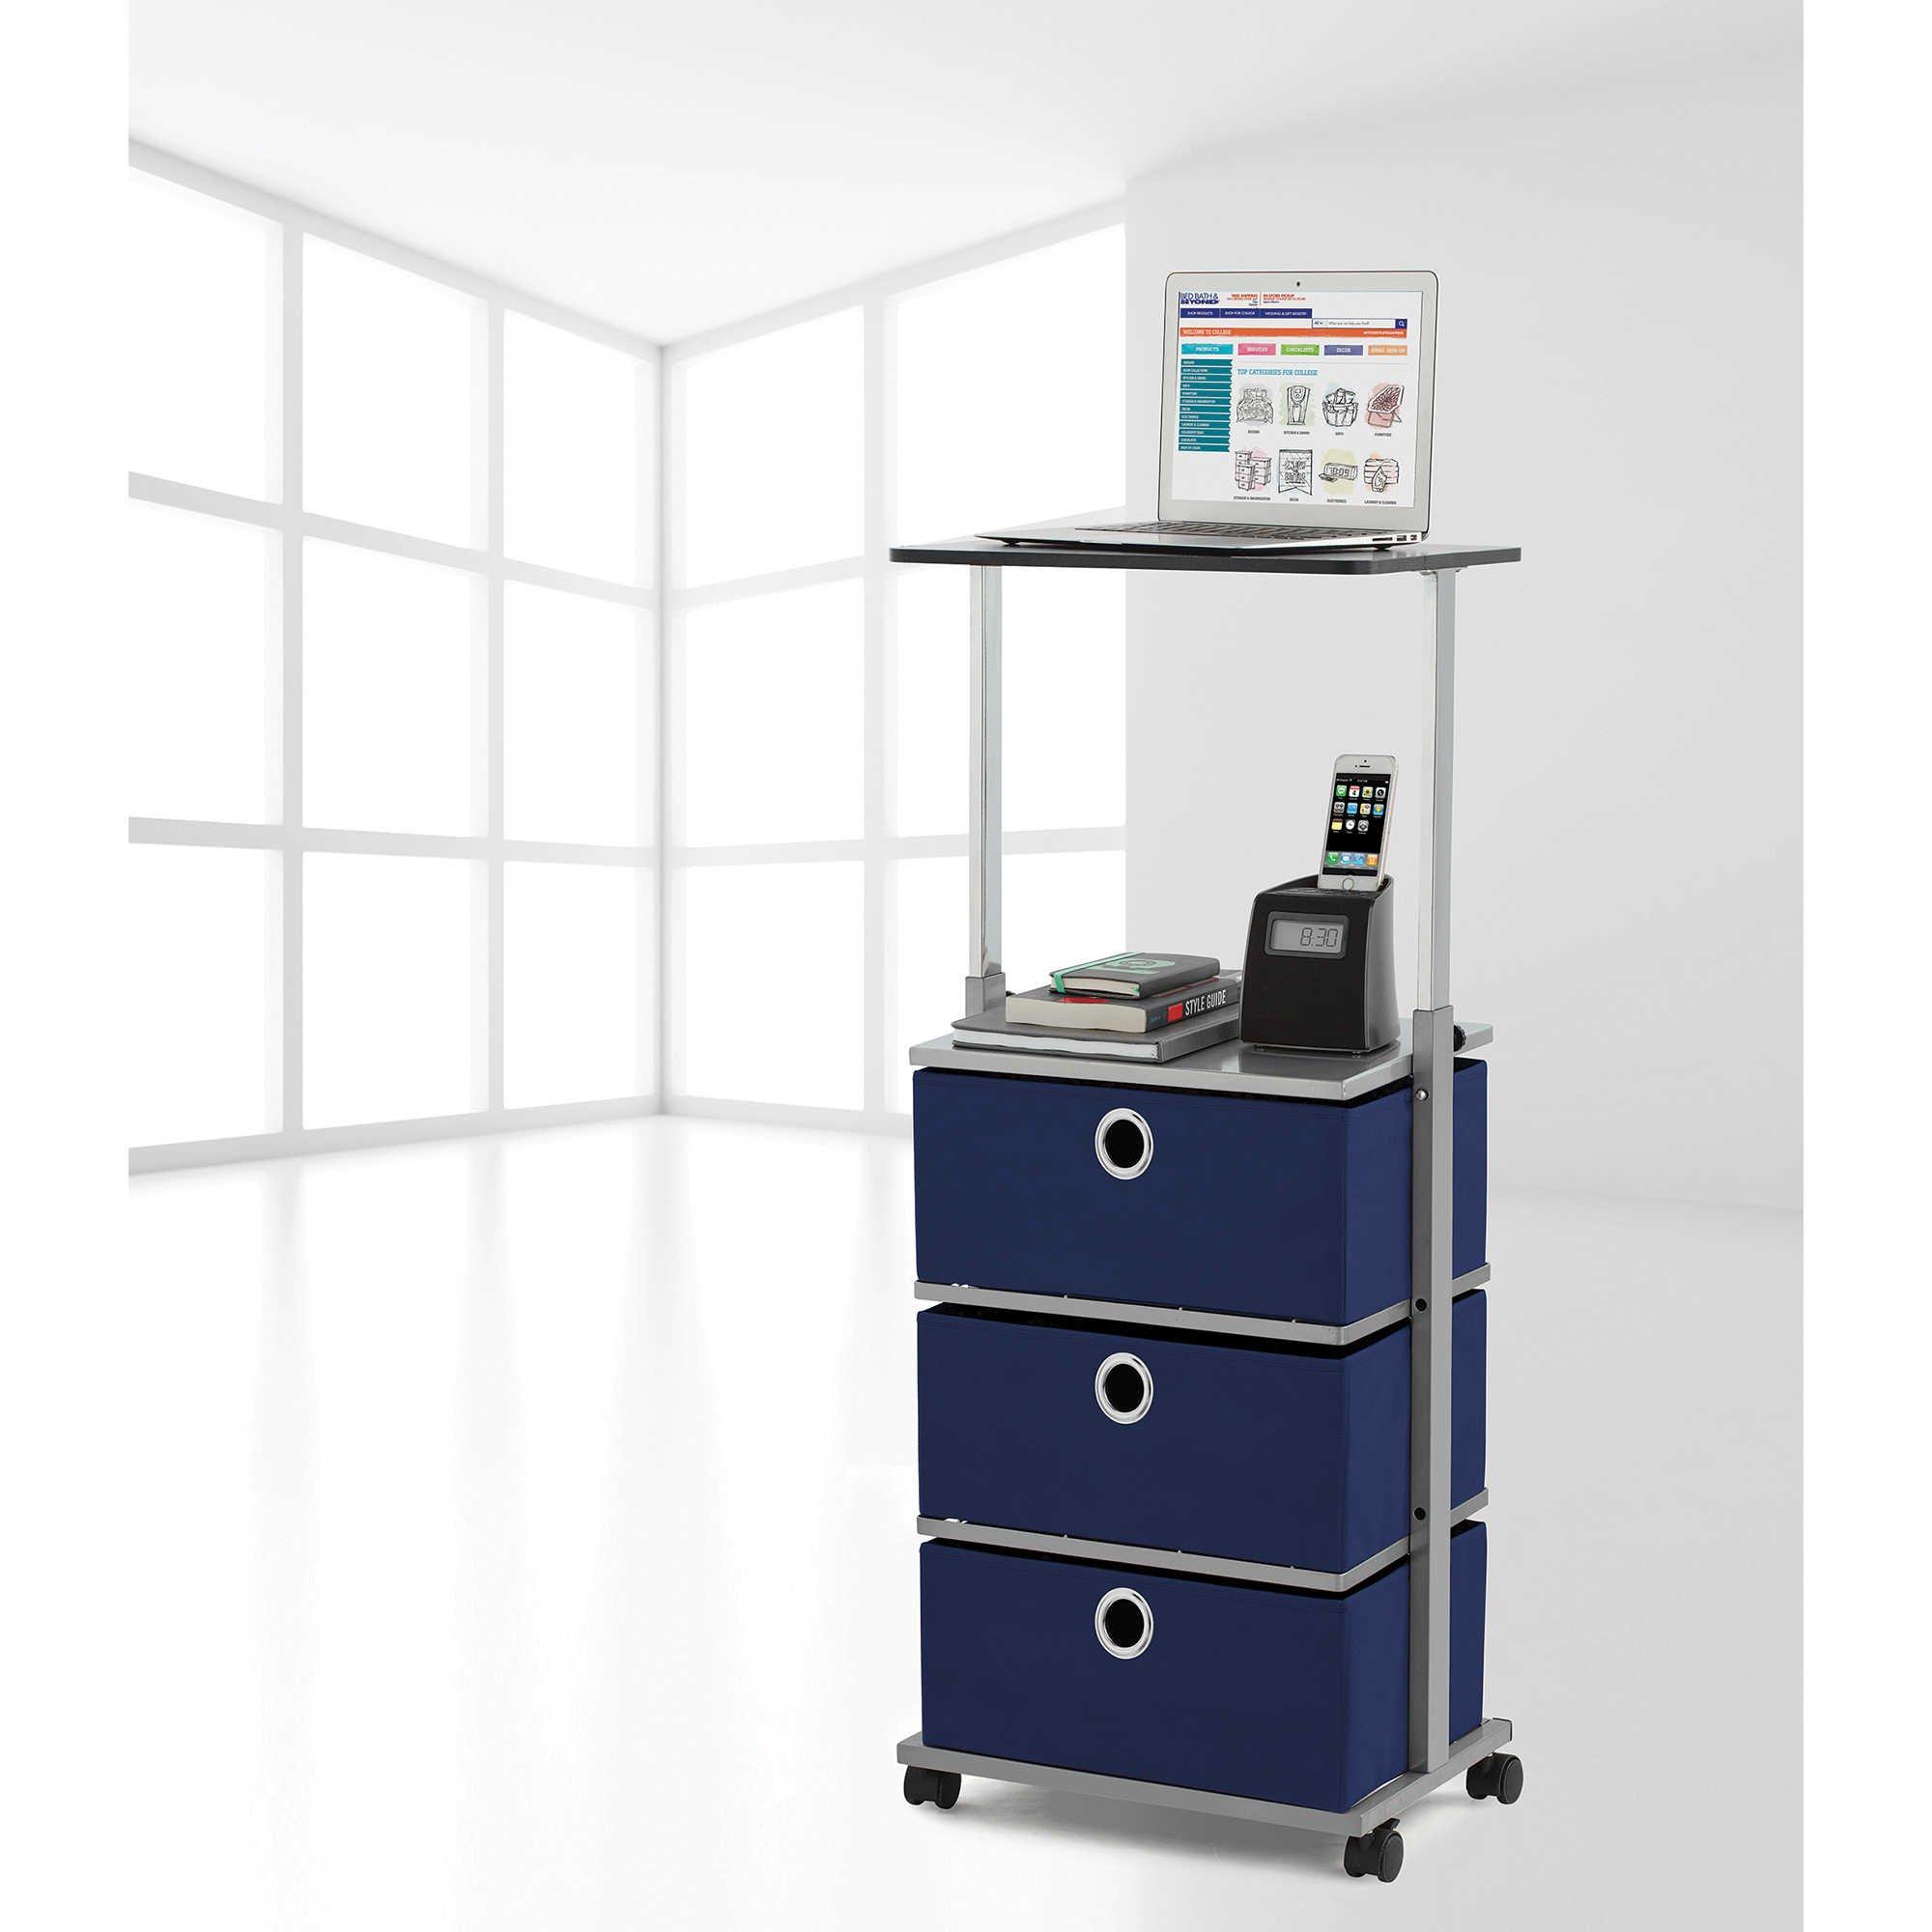 Studio 3B 3-Soft Fabric Bin Drawer Adjustable Top Shelf Steel Frame Storage Utility Cart in Blue with 4 Caster Wheels